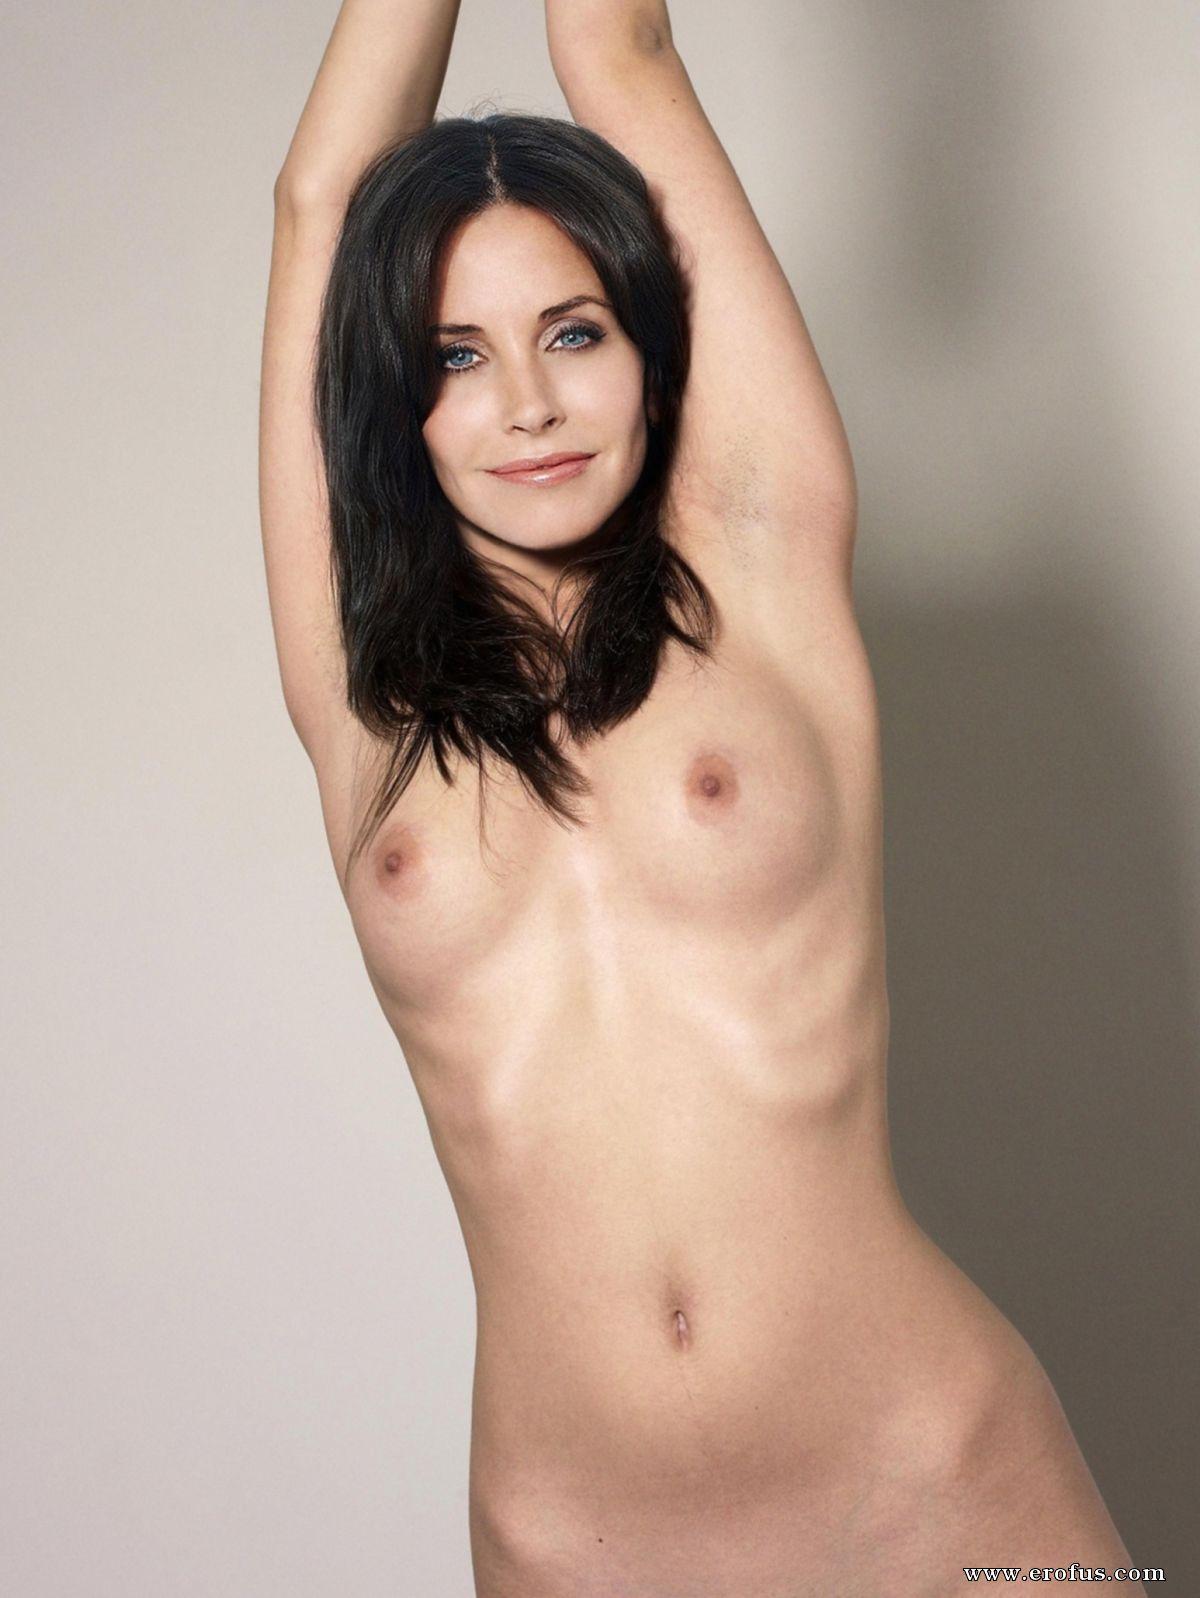 Courteney Cox Naked Celebrities